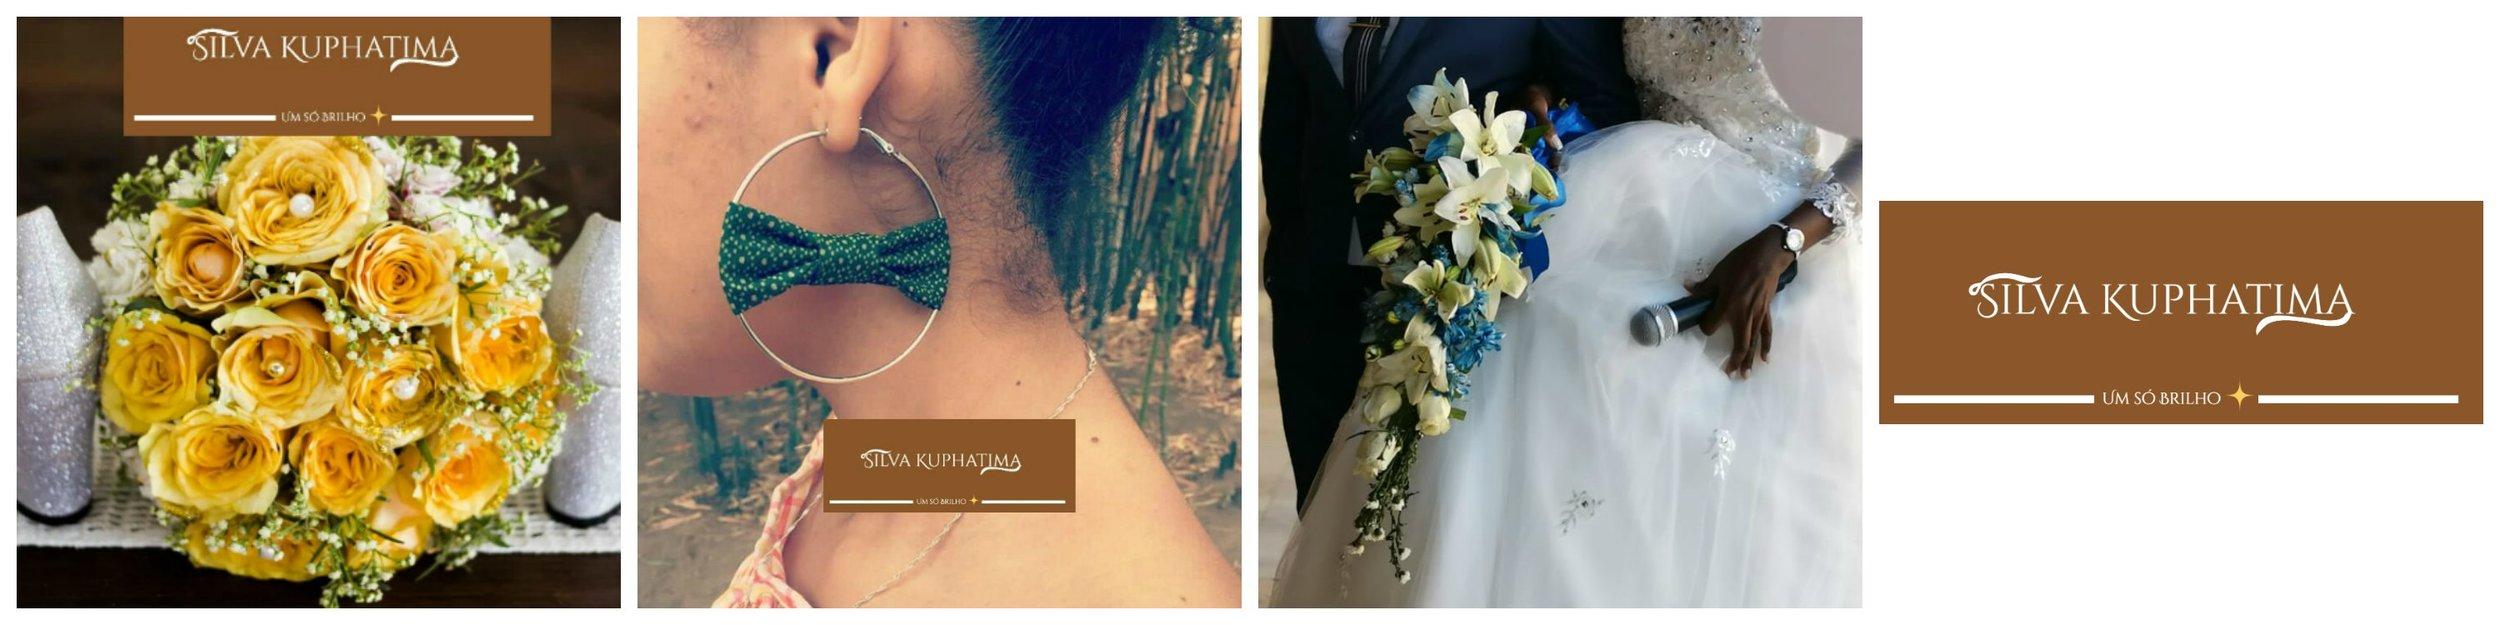 Silva-Collage-3.jpg